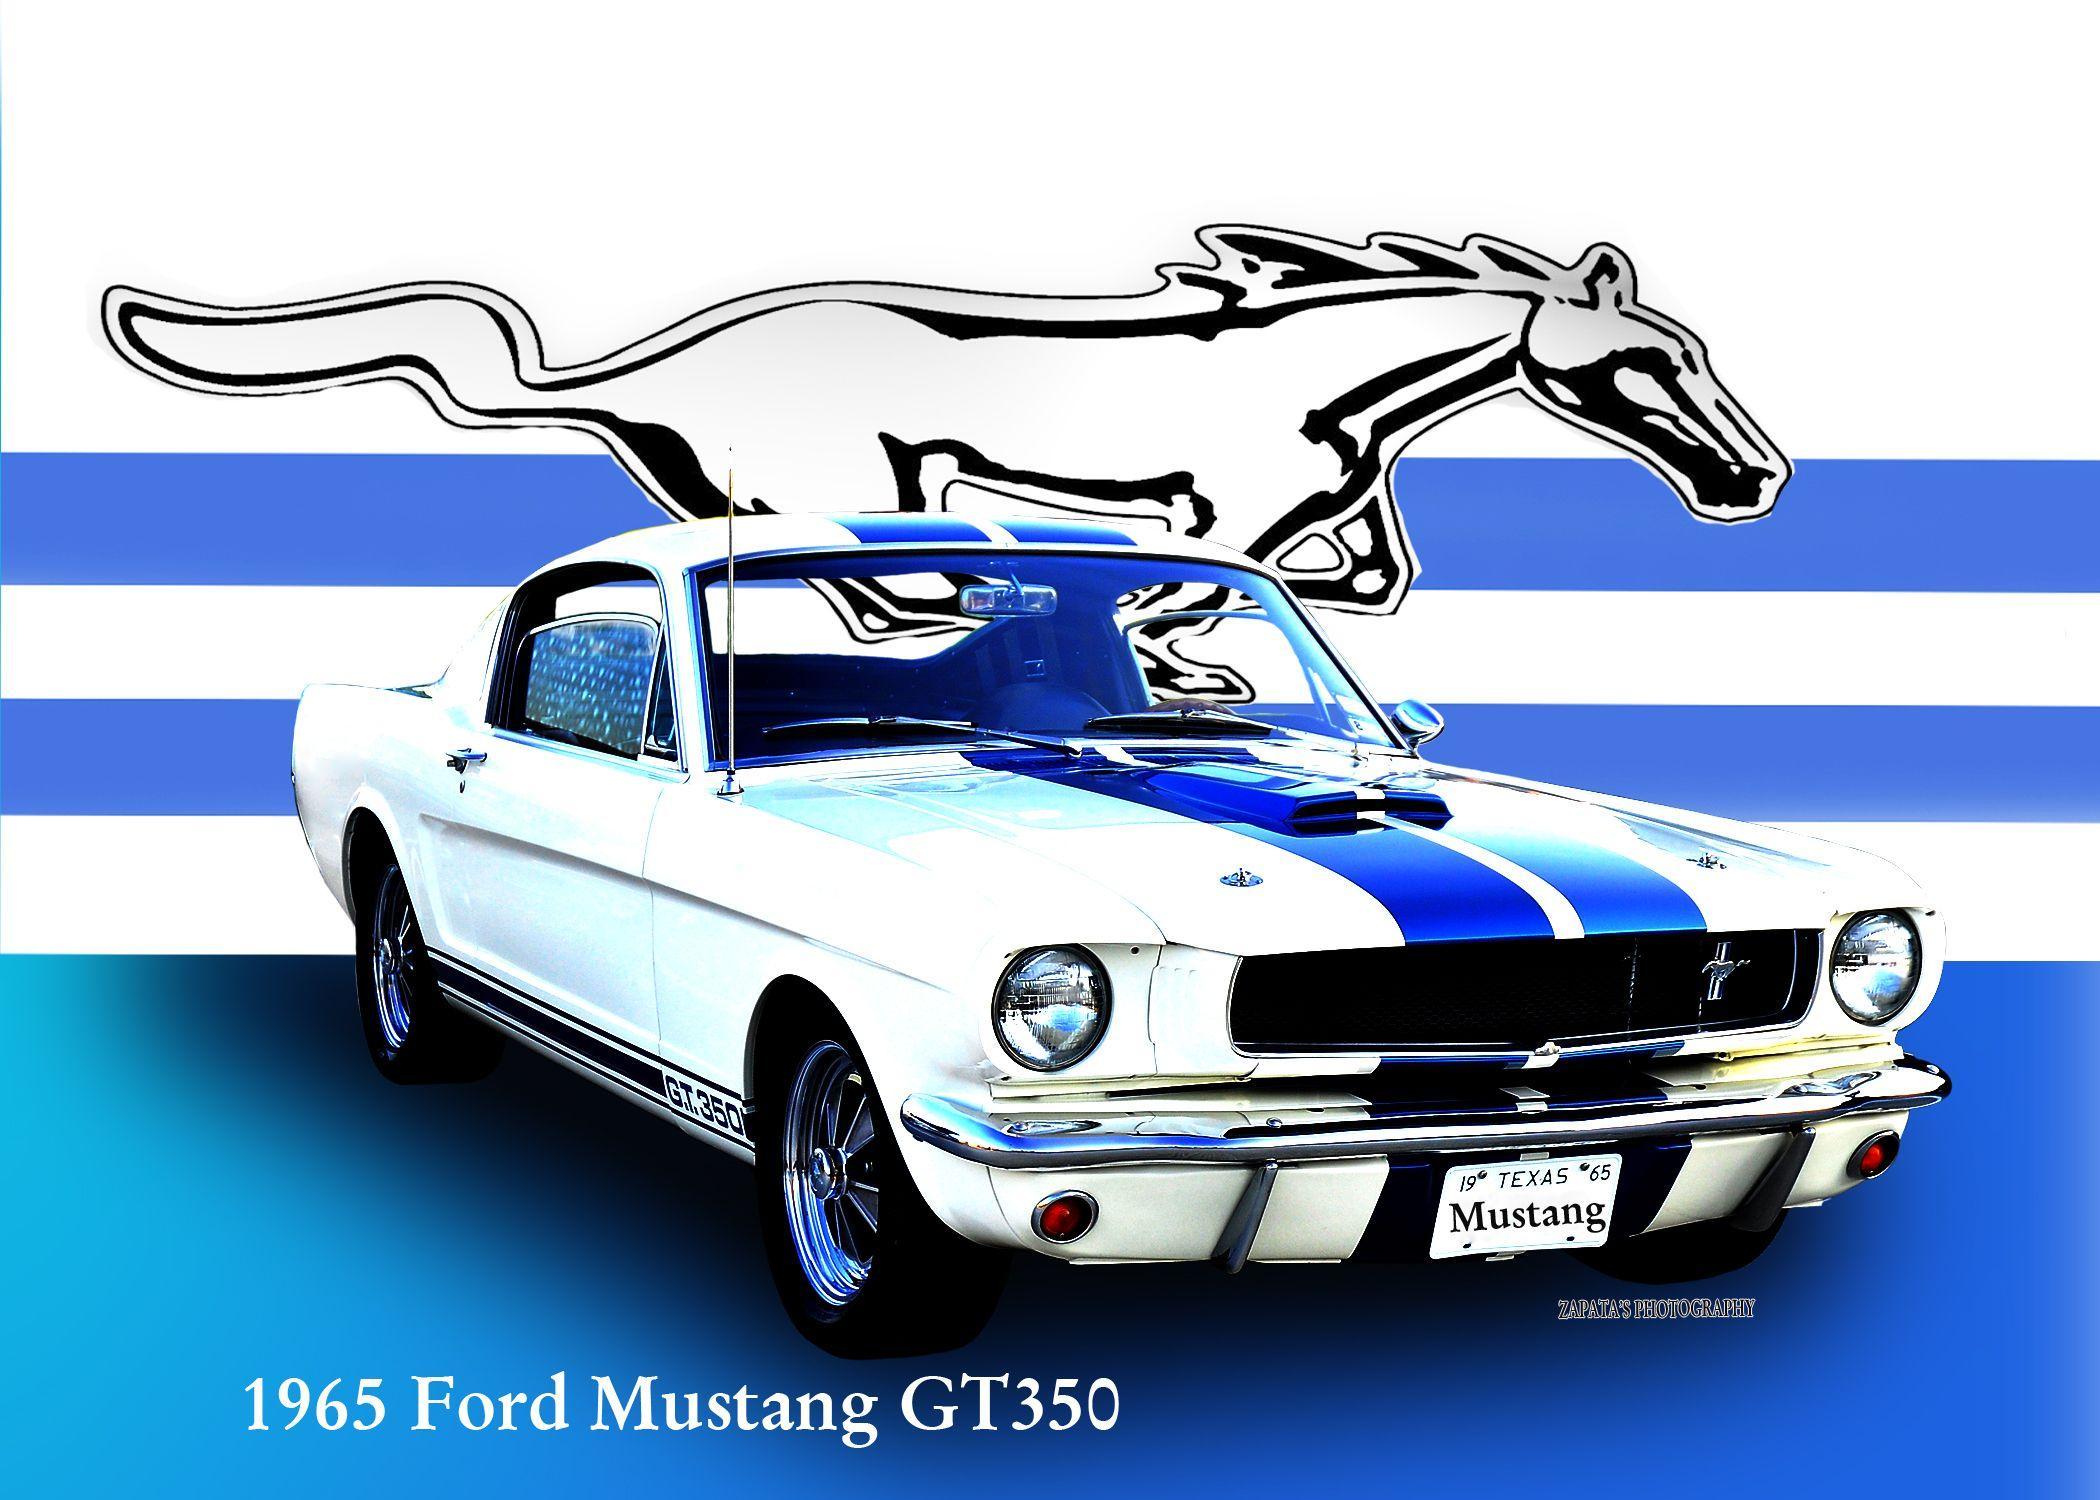 1965 Mustang Wallpapers Wallpaper Cave